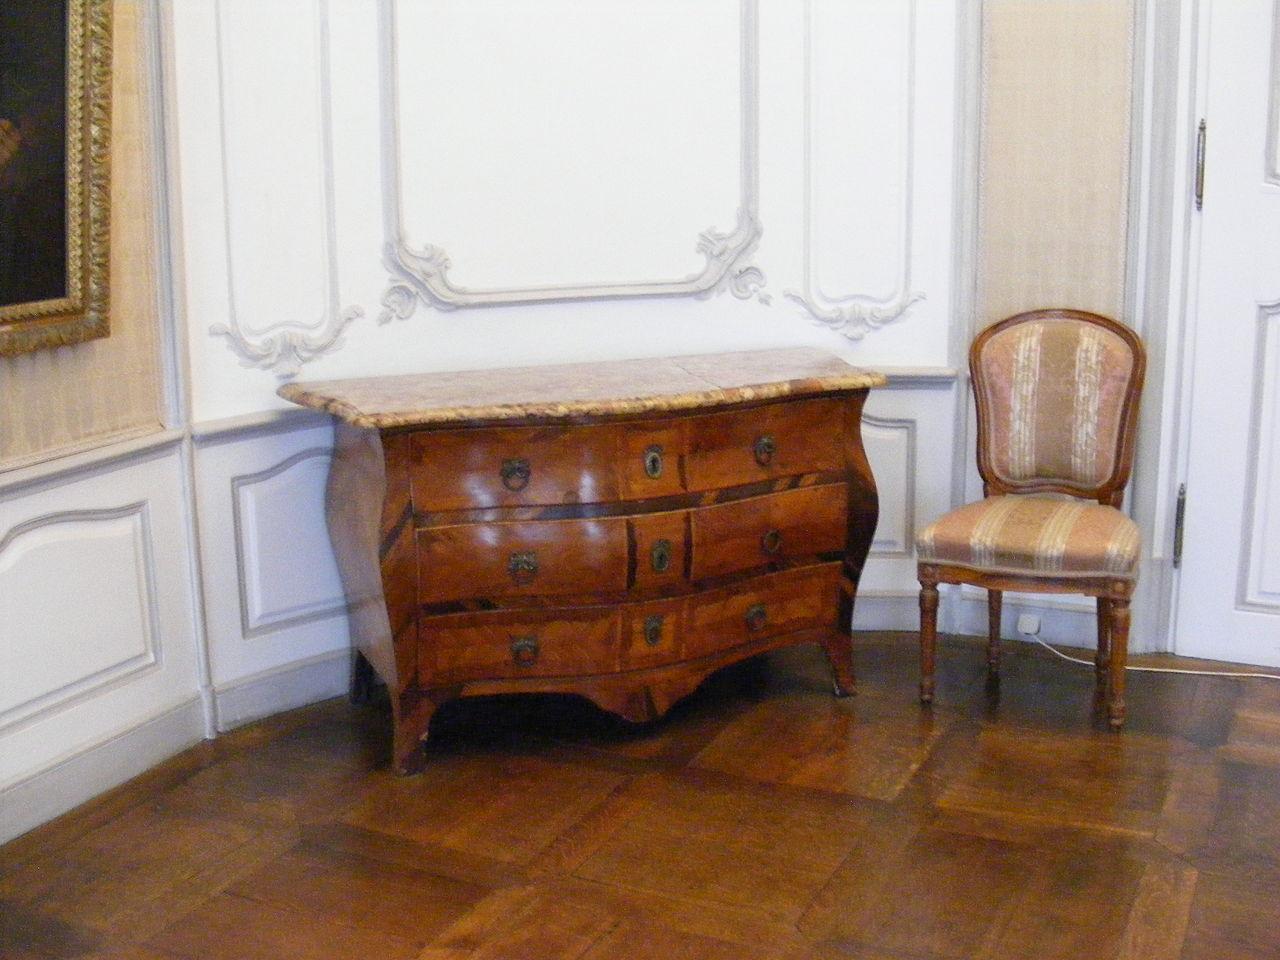 file residenzmuseum bamberg m bel der biedermeierzeit jpg wikimedia commons. Black Bedroom Furniture Sets. Home Design Ideas